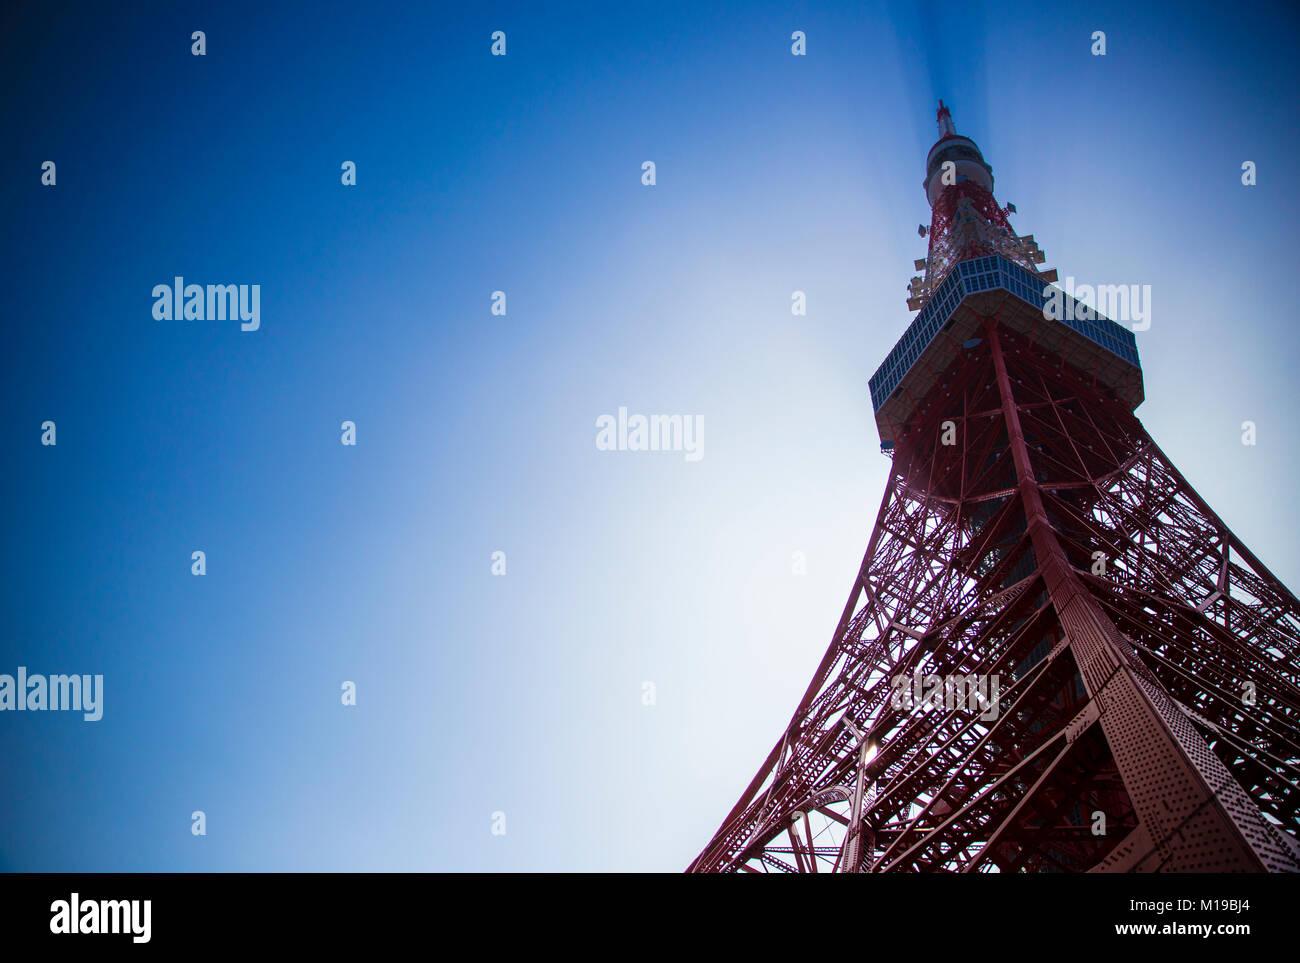 Tokyo Tower, Japan - Stock Image